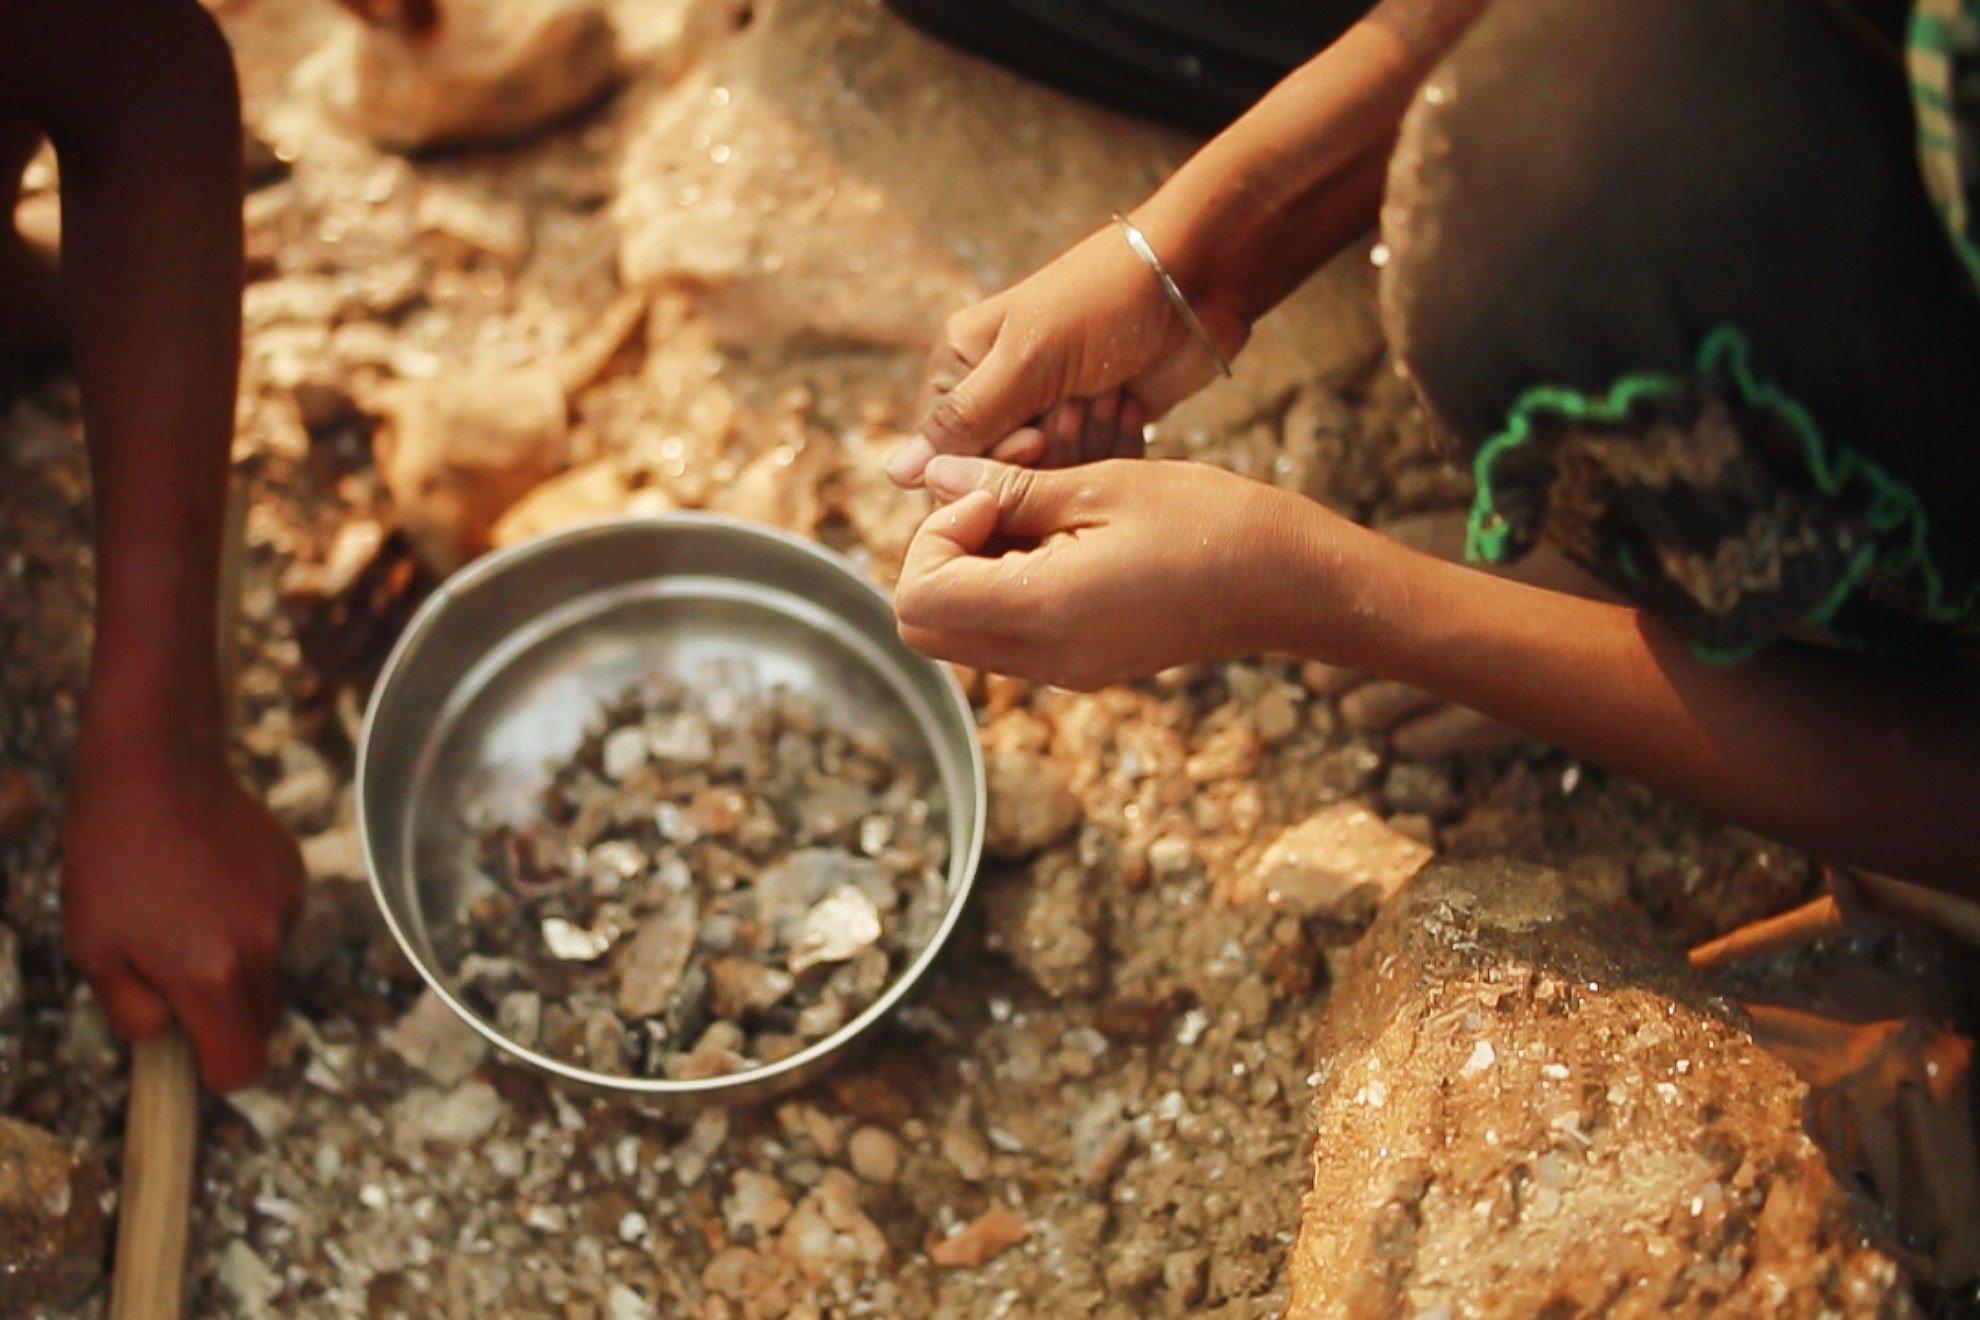 India-Hands-mining_MIAFW